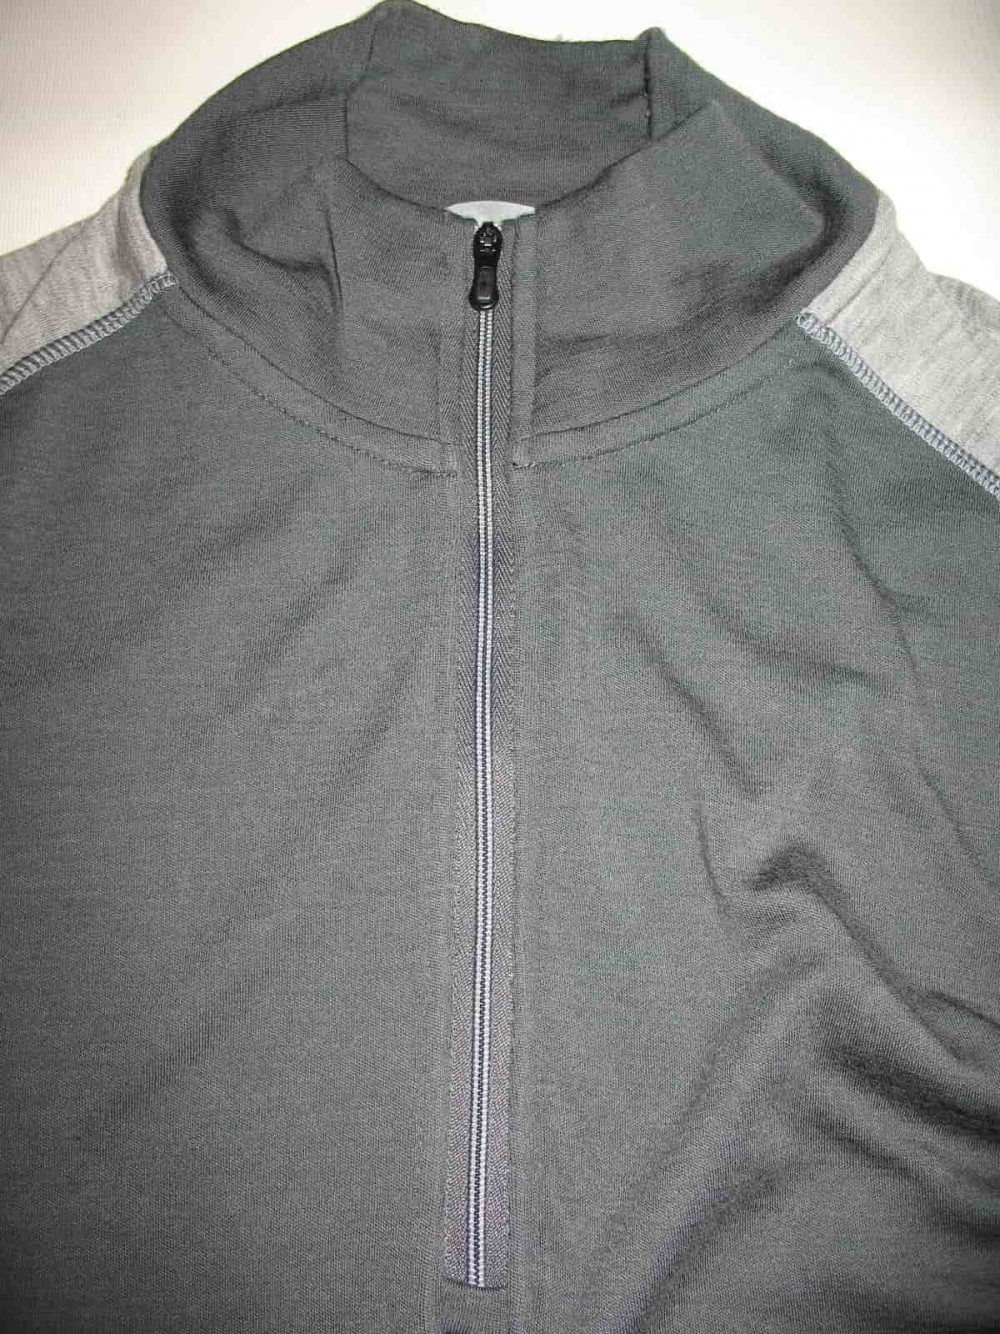 Кофта SMARTWOOL merino 250 base layer 1/4 zip grey jersey (размер XL) - 3